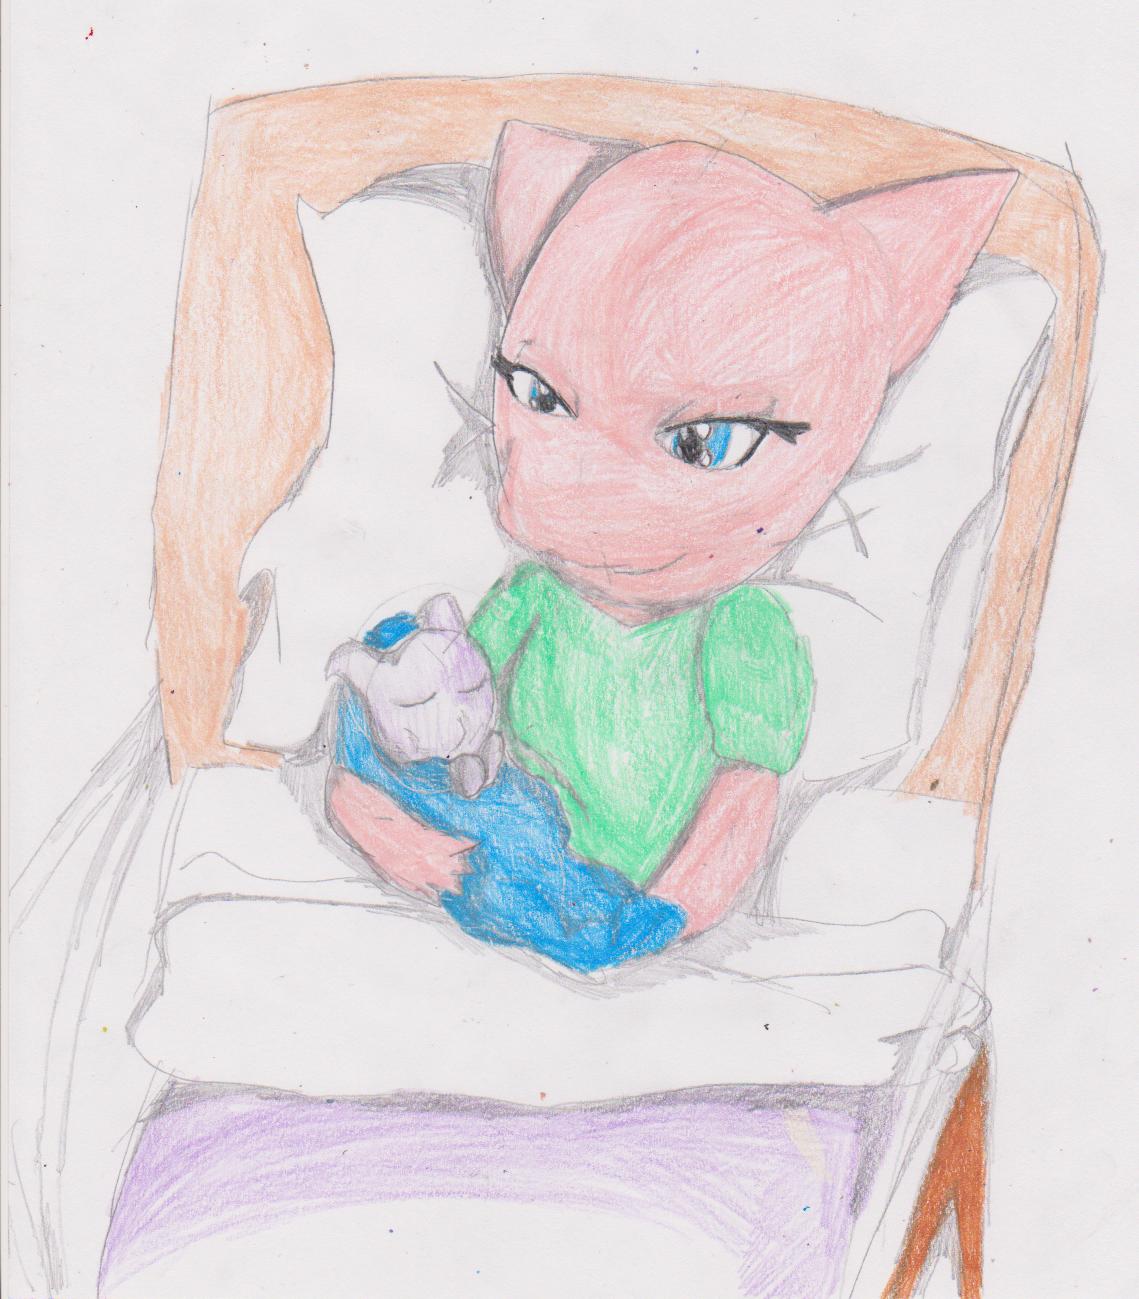 Febuary 6th: Mew Gave Birth by MsLunarUmbreon on DeviantArt